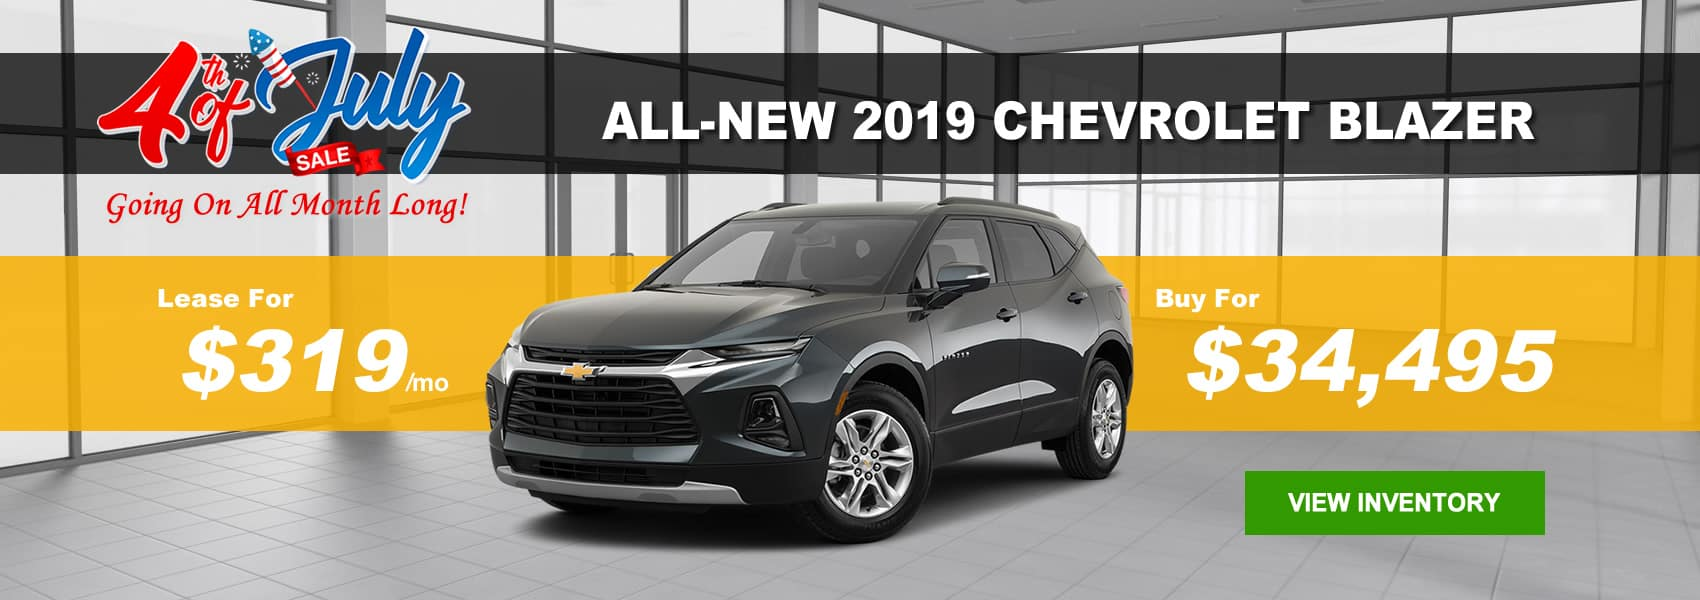 Lannan Chevrolet Boston Ma Chevy Dealer In Lowell Ma